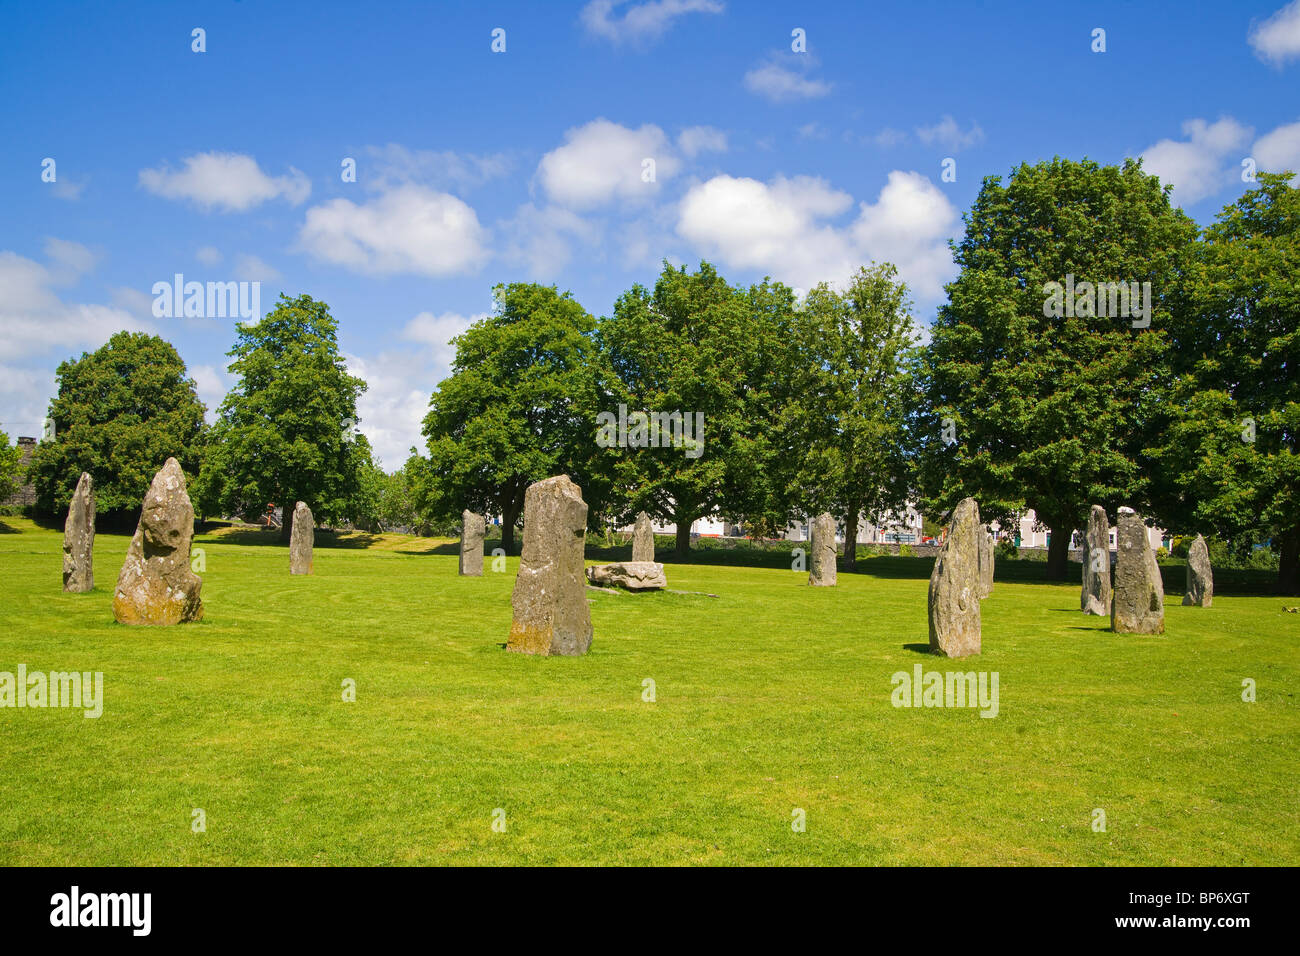 Llanrwst, Stone Circle, Snowdonia, north Wales, UK - Stock Image